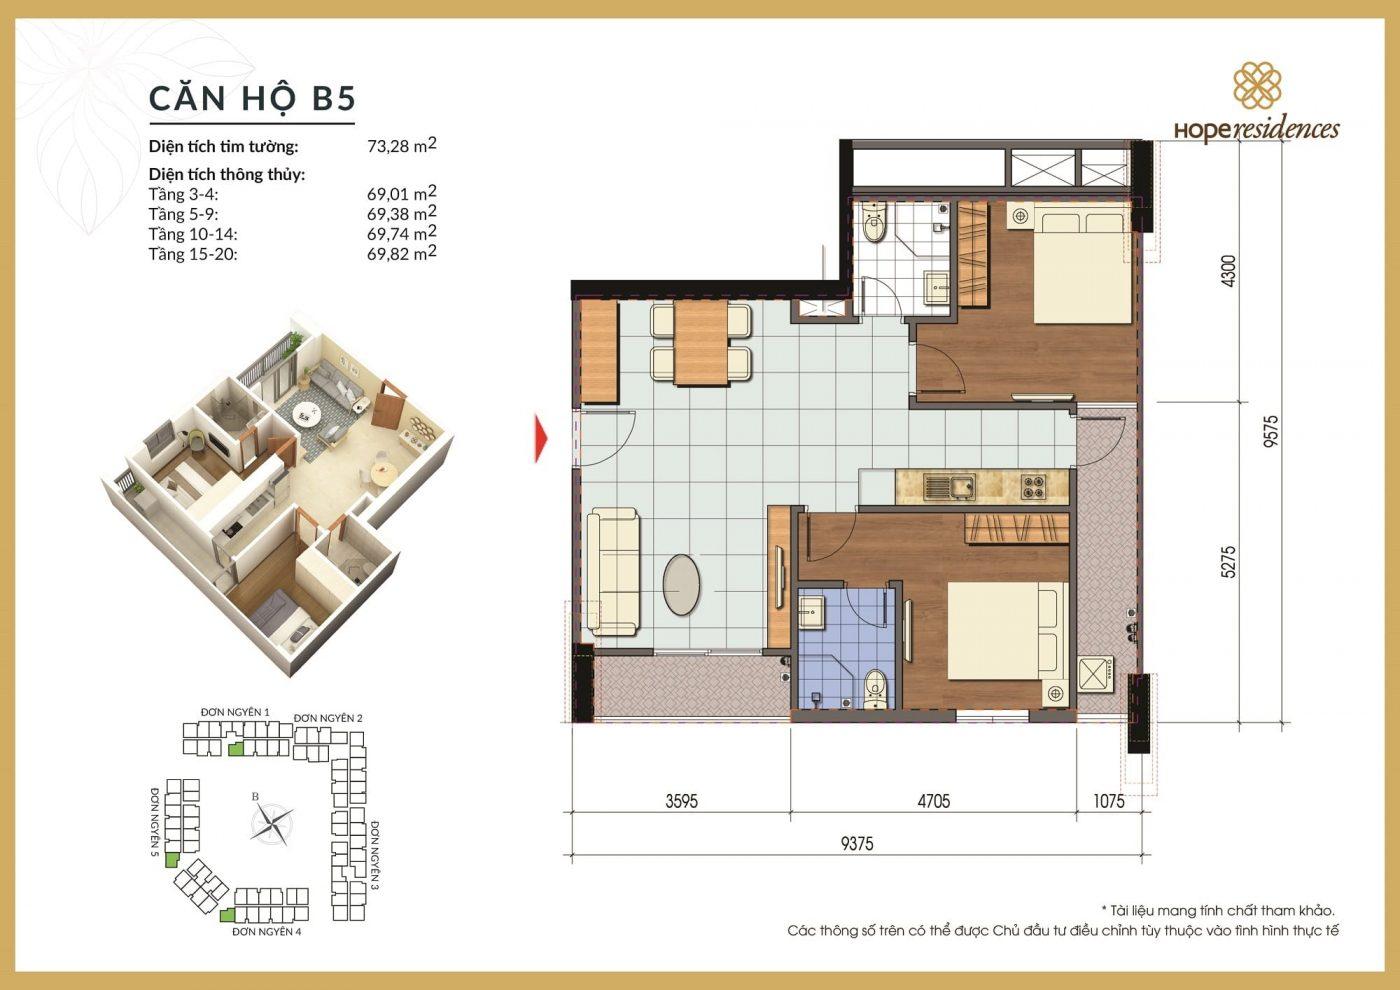 mat bang thiet ke can ho b5 hope residences